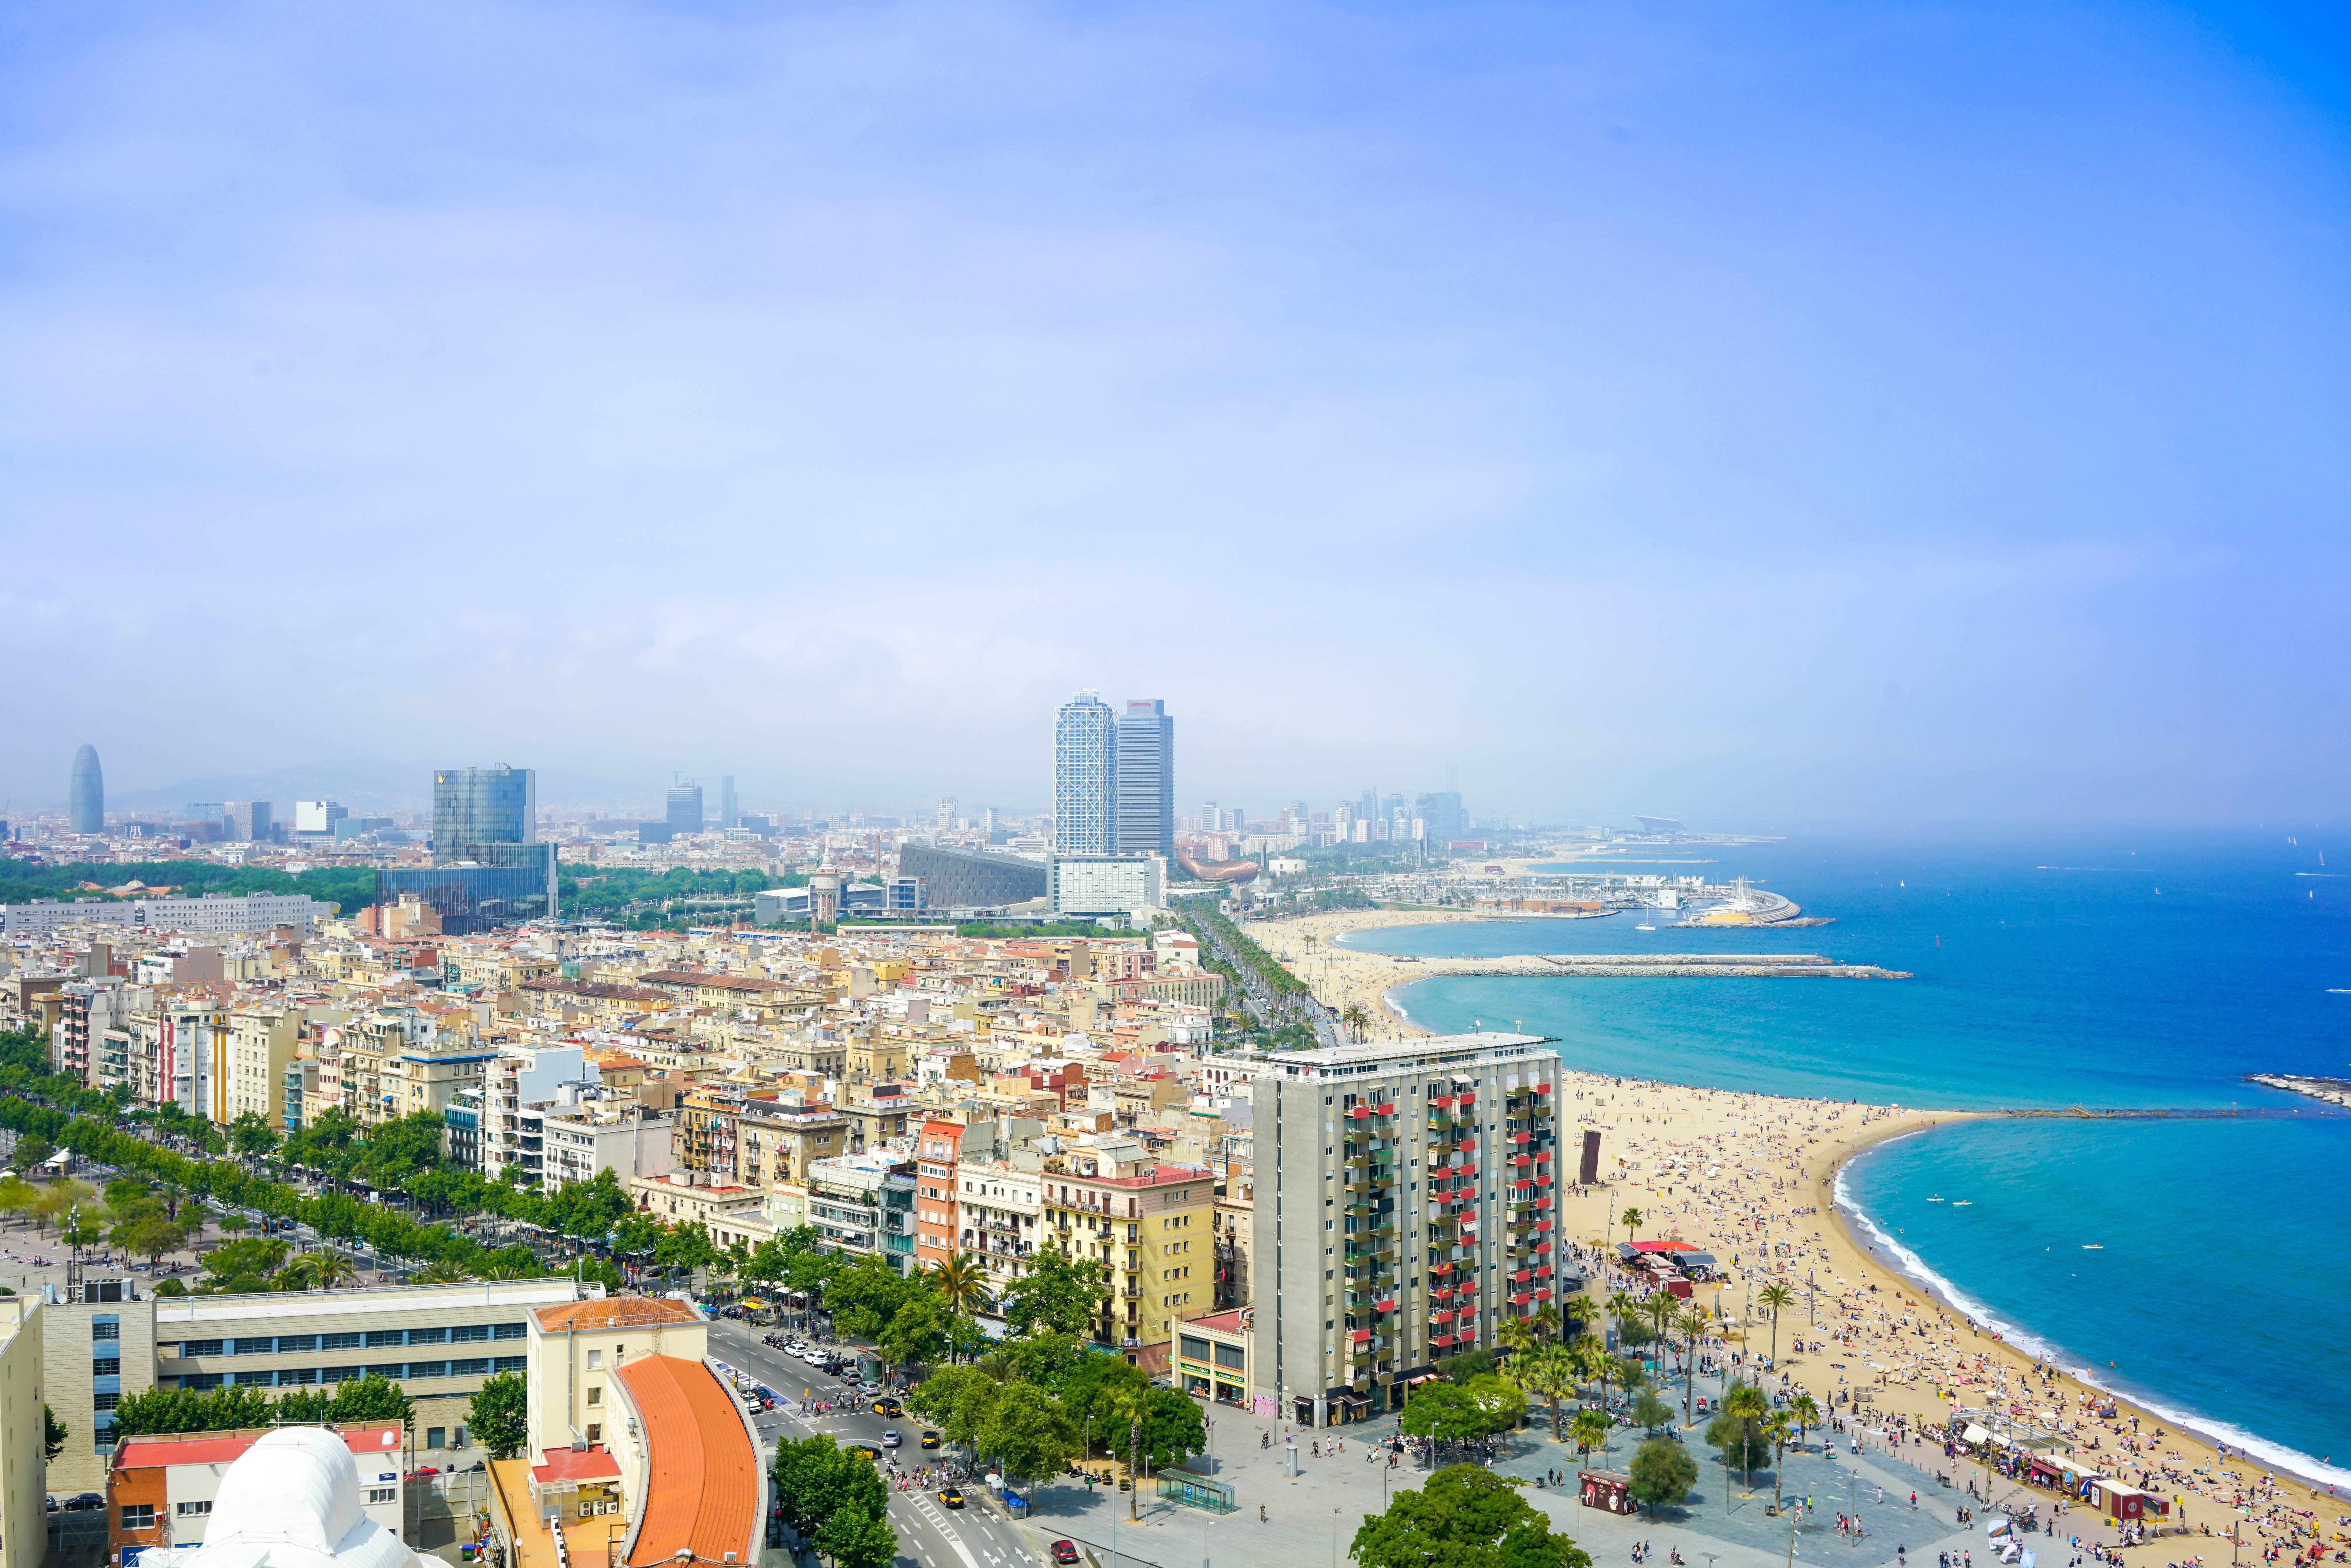 6.-Urban-beaches-Enes-on-Unsplash